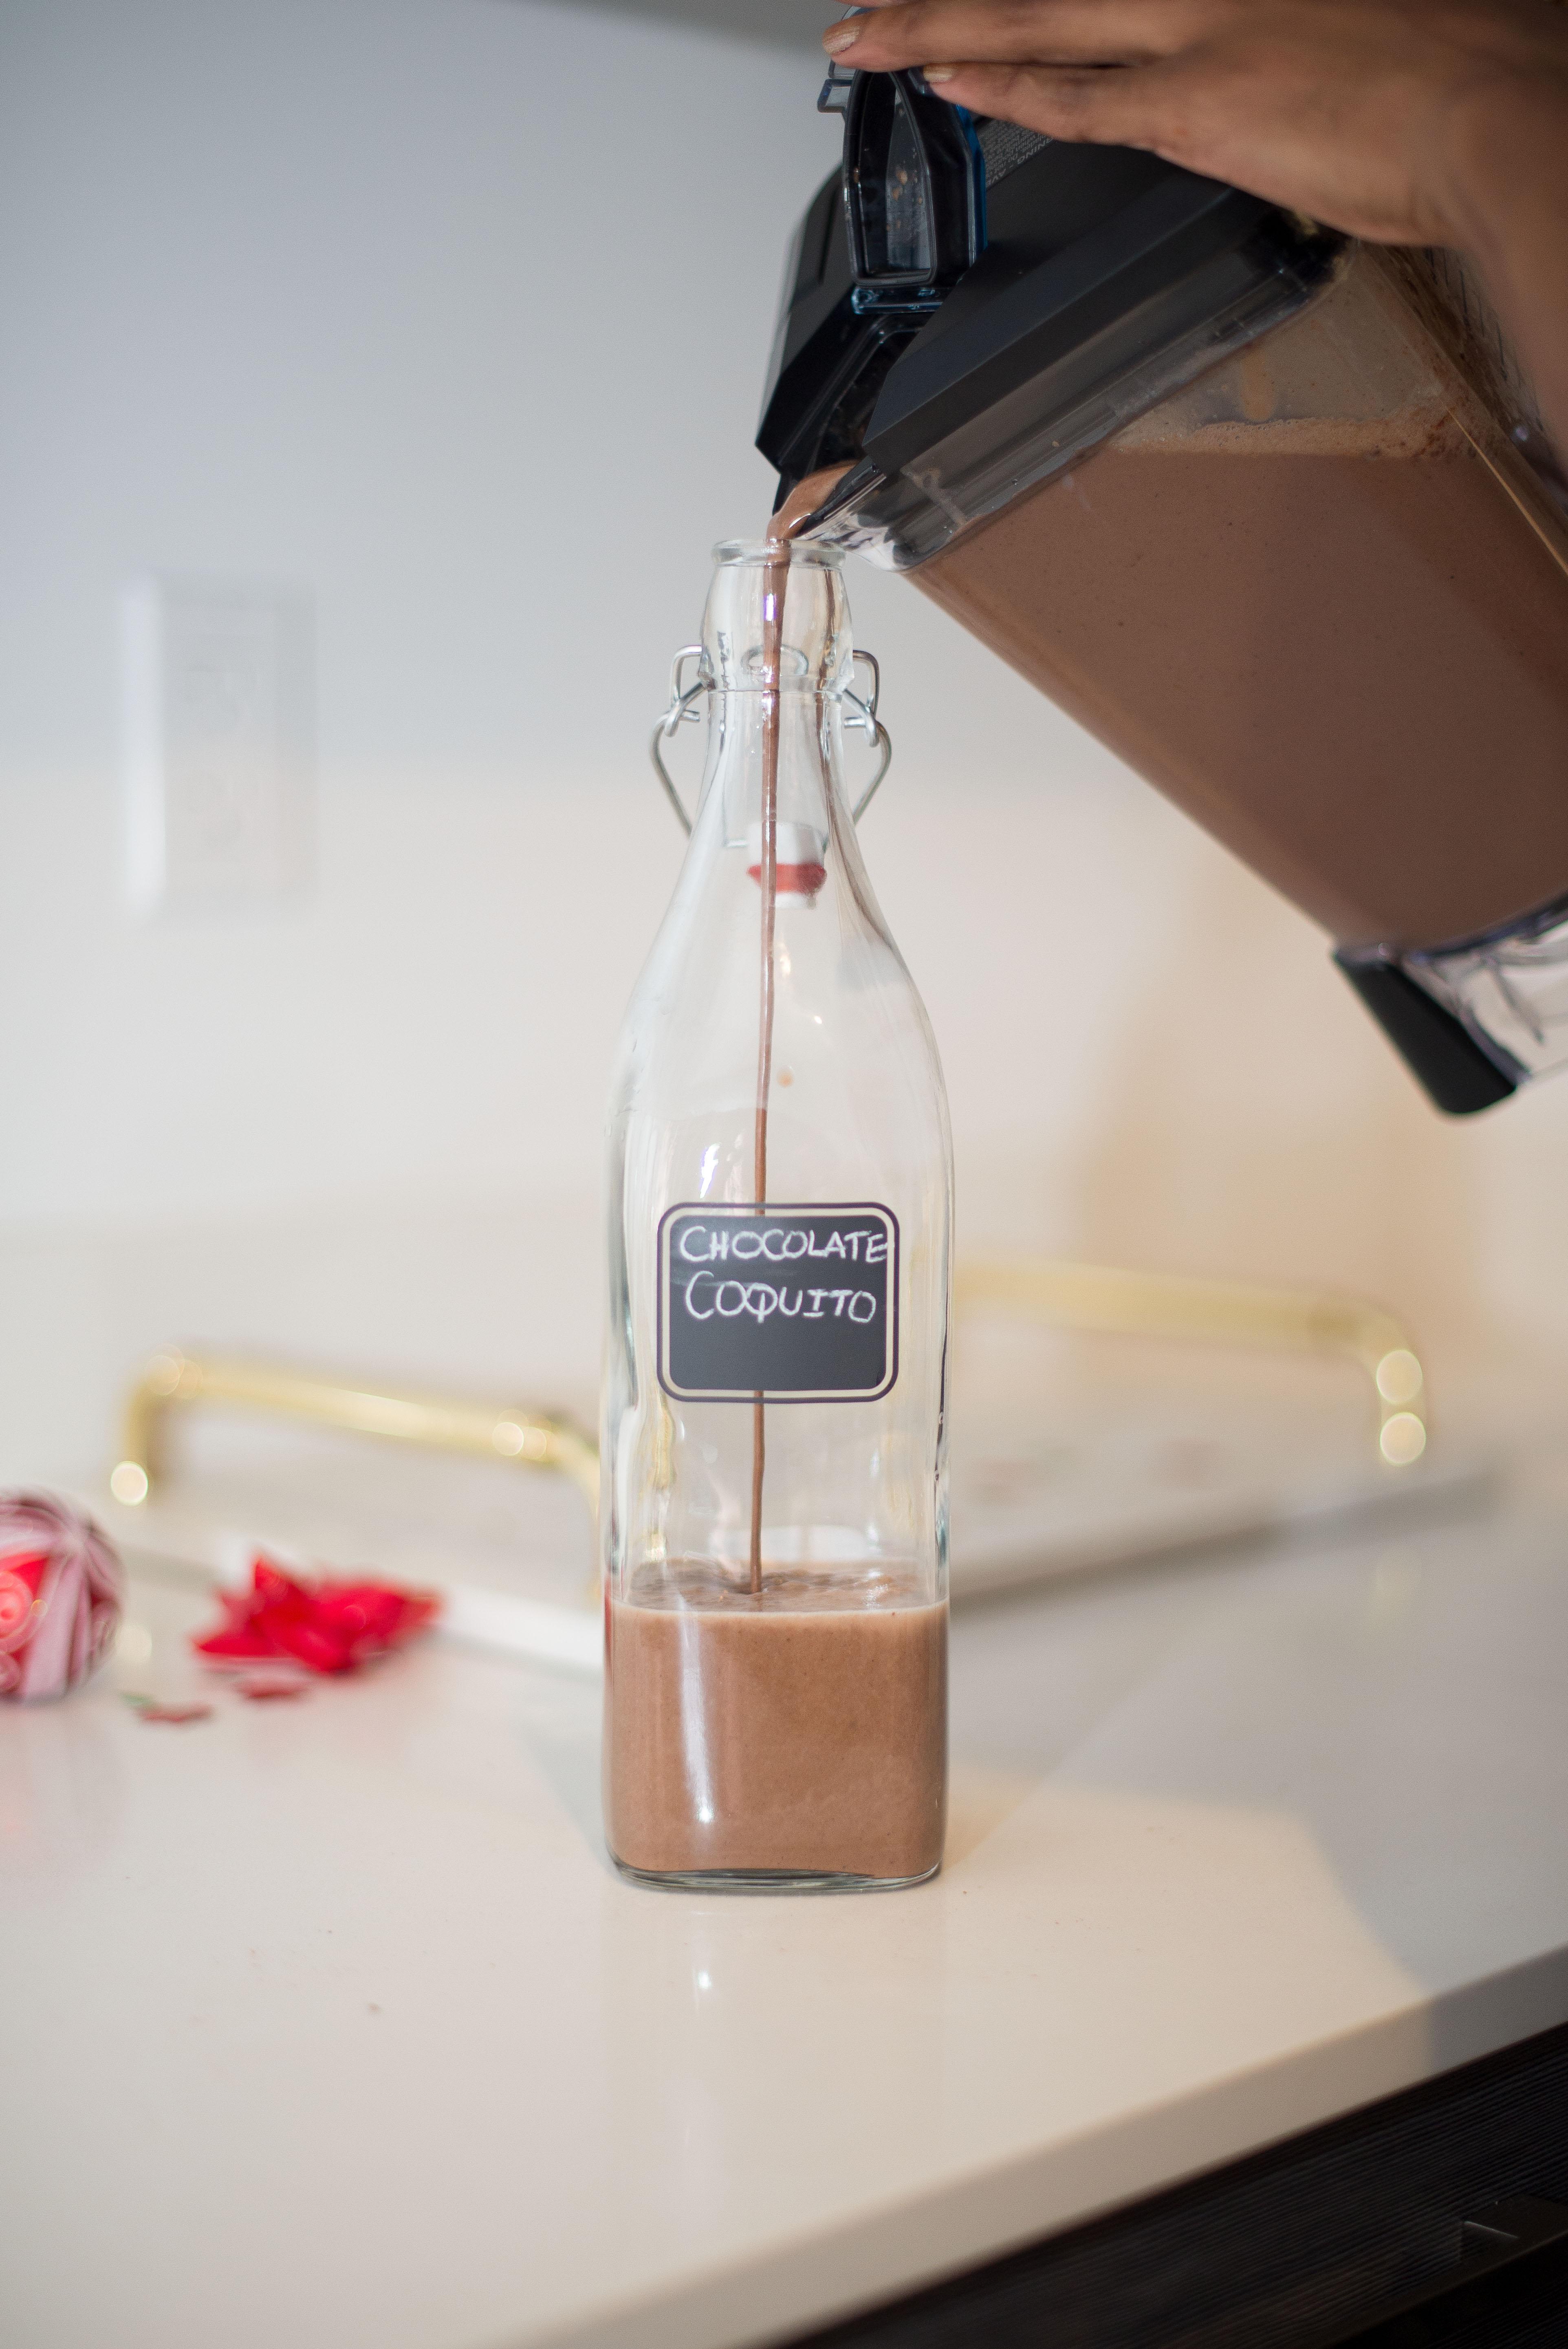 Chocolate_Coqutio_Recipe_Puerto_Rican_Egg_Nog_pouring_coquito